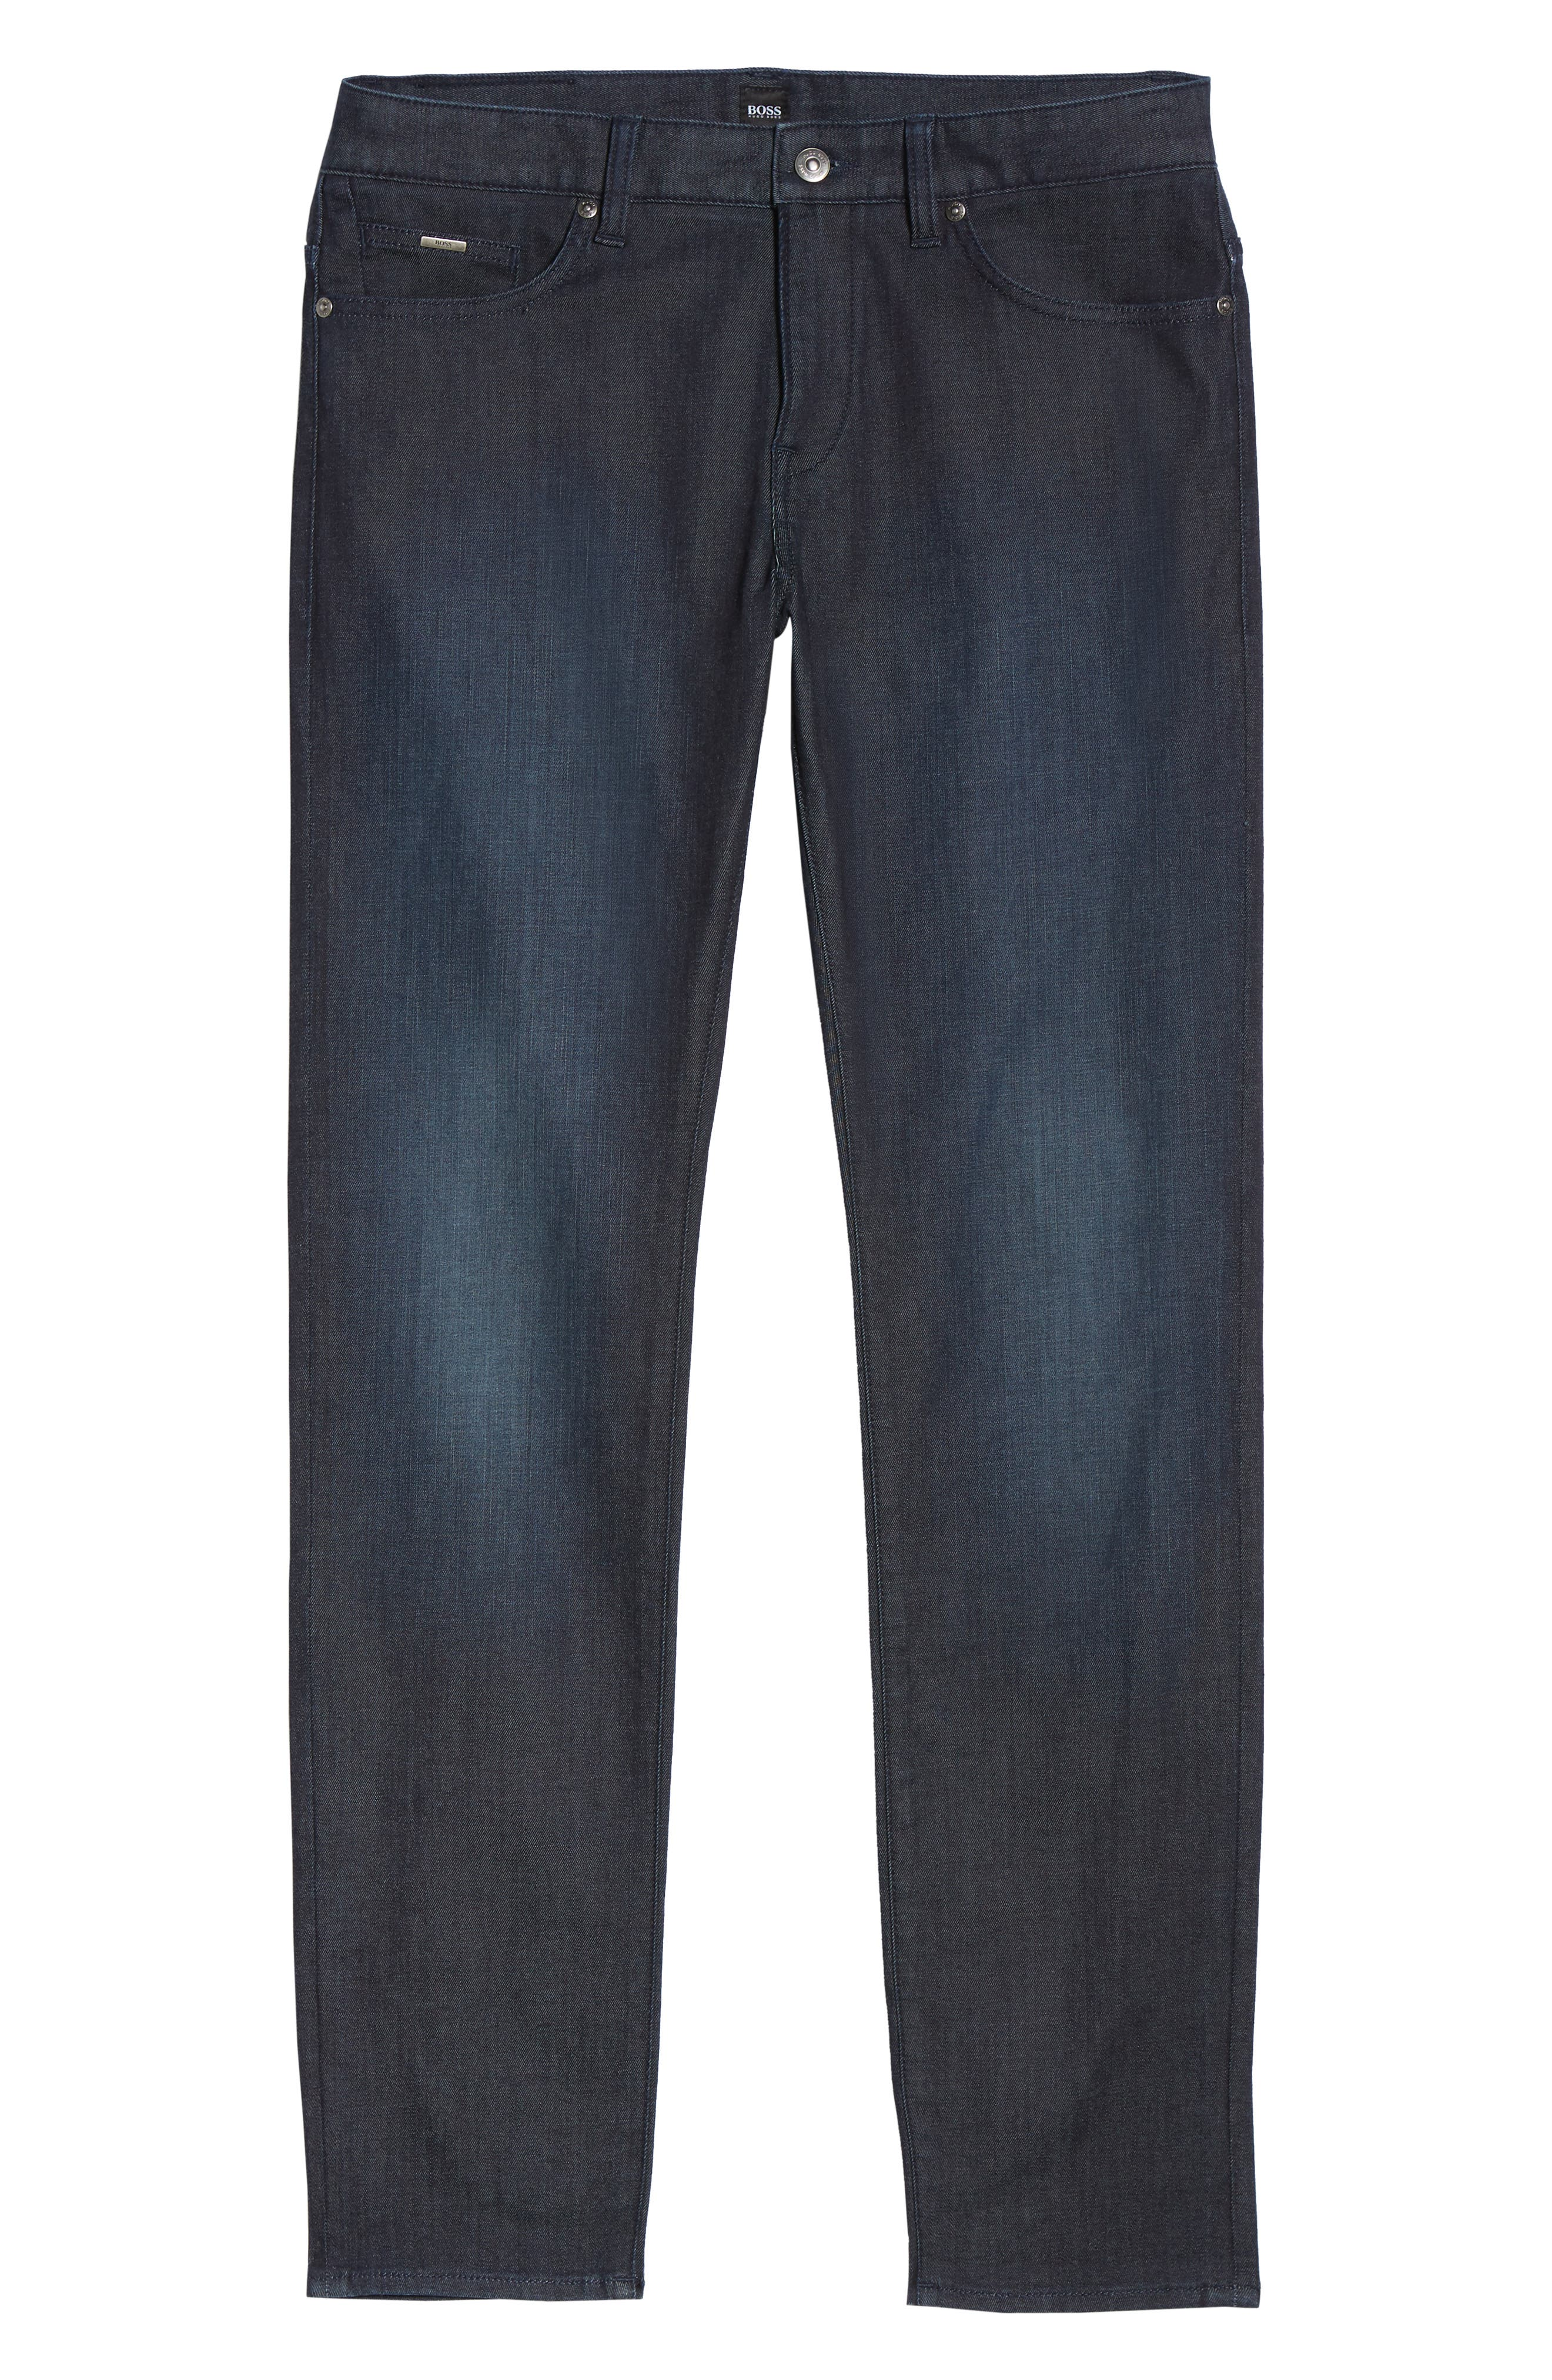 Delaware Slim Fit Jeans,                             Alternate thumbnail 6, color,